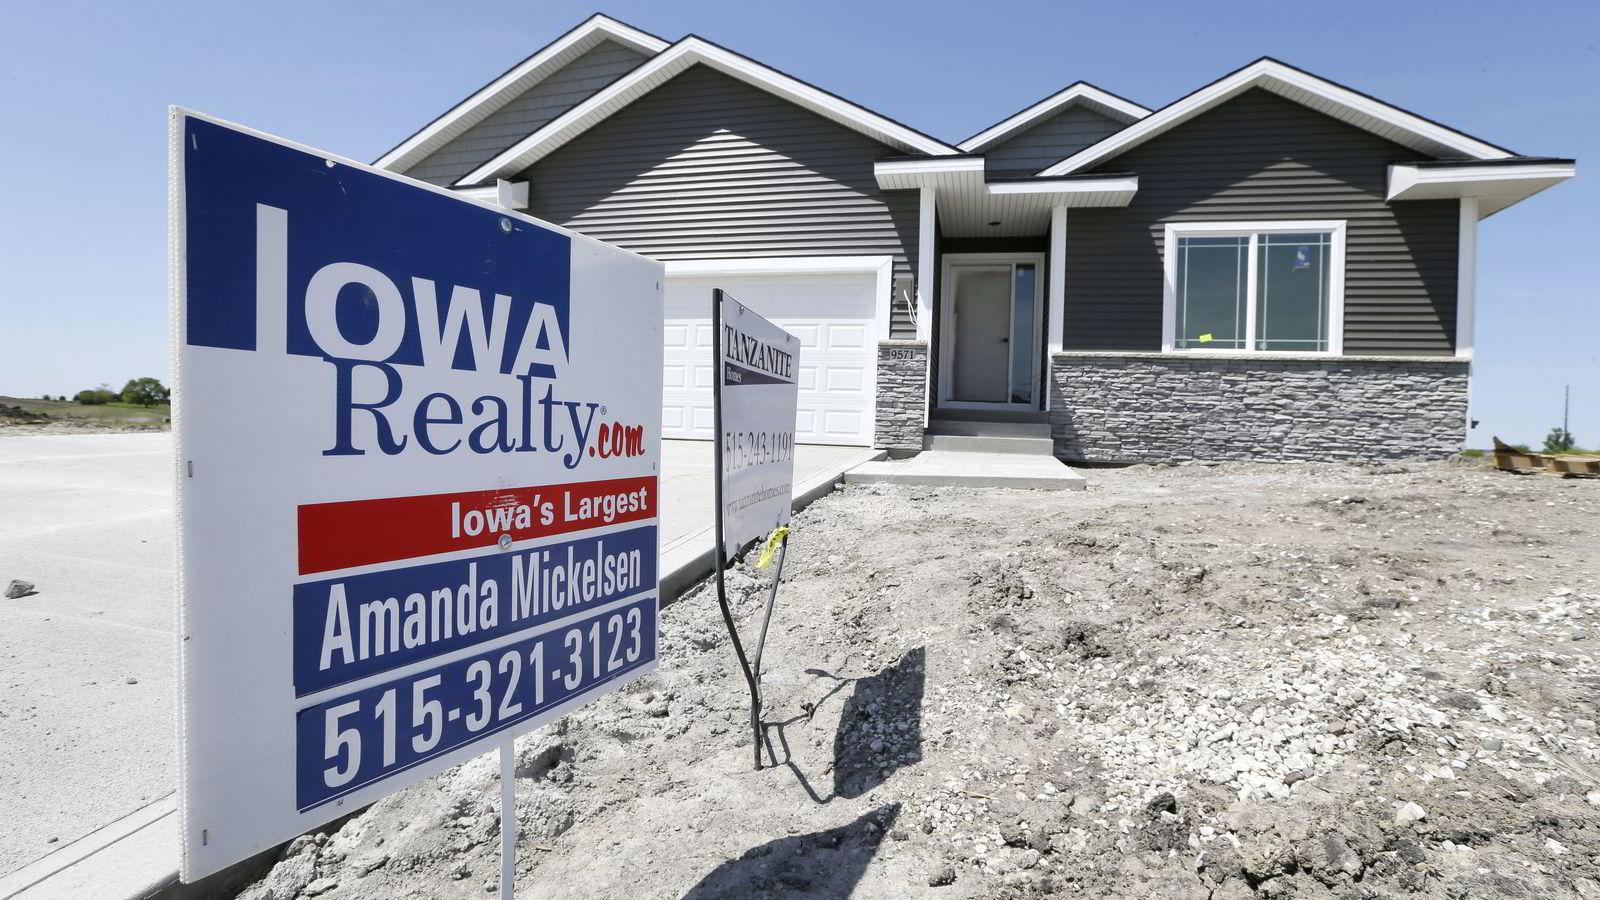 Boligbyggingen i USA falt tilbake i mai. Her en ny bolig for salg i West Des Moines, Iowa, 24. mai. 2014. Foto: AP Photo/Charlie Neibergall.